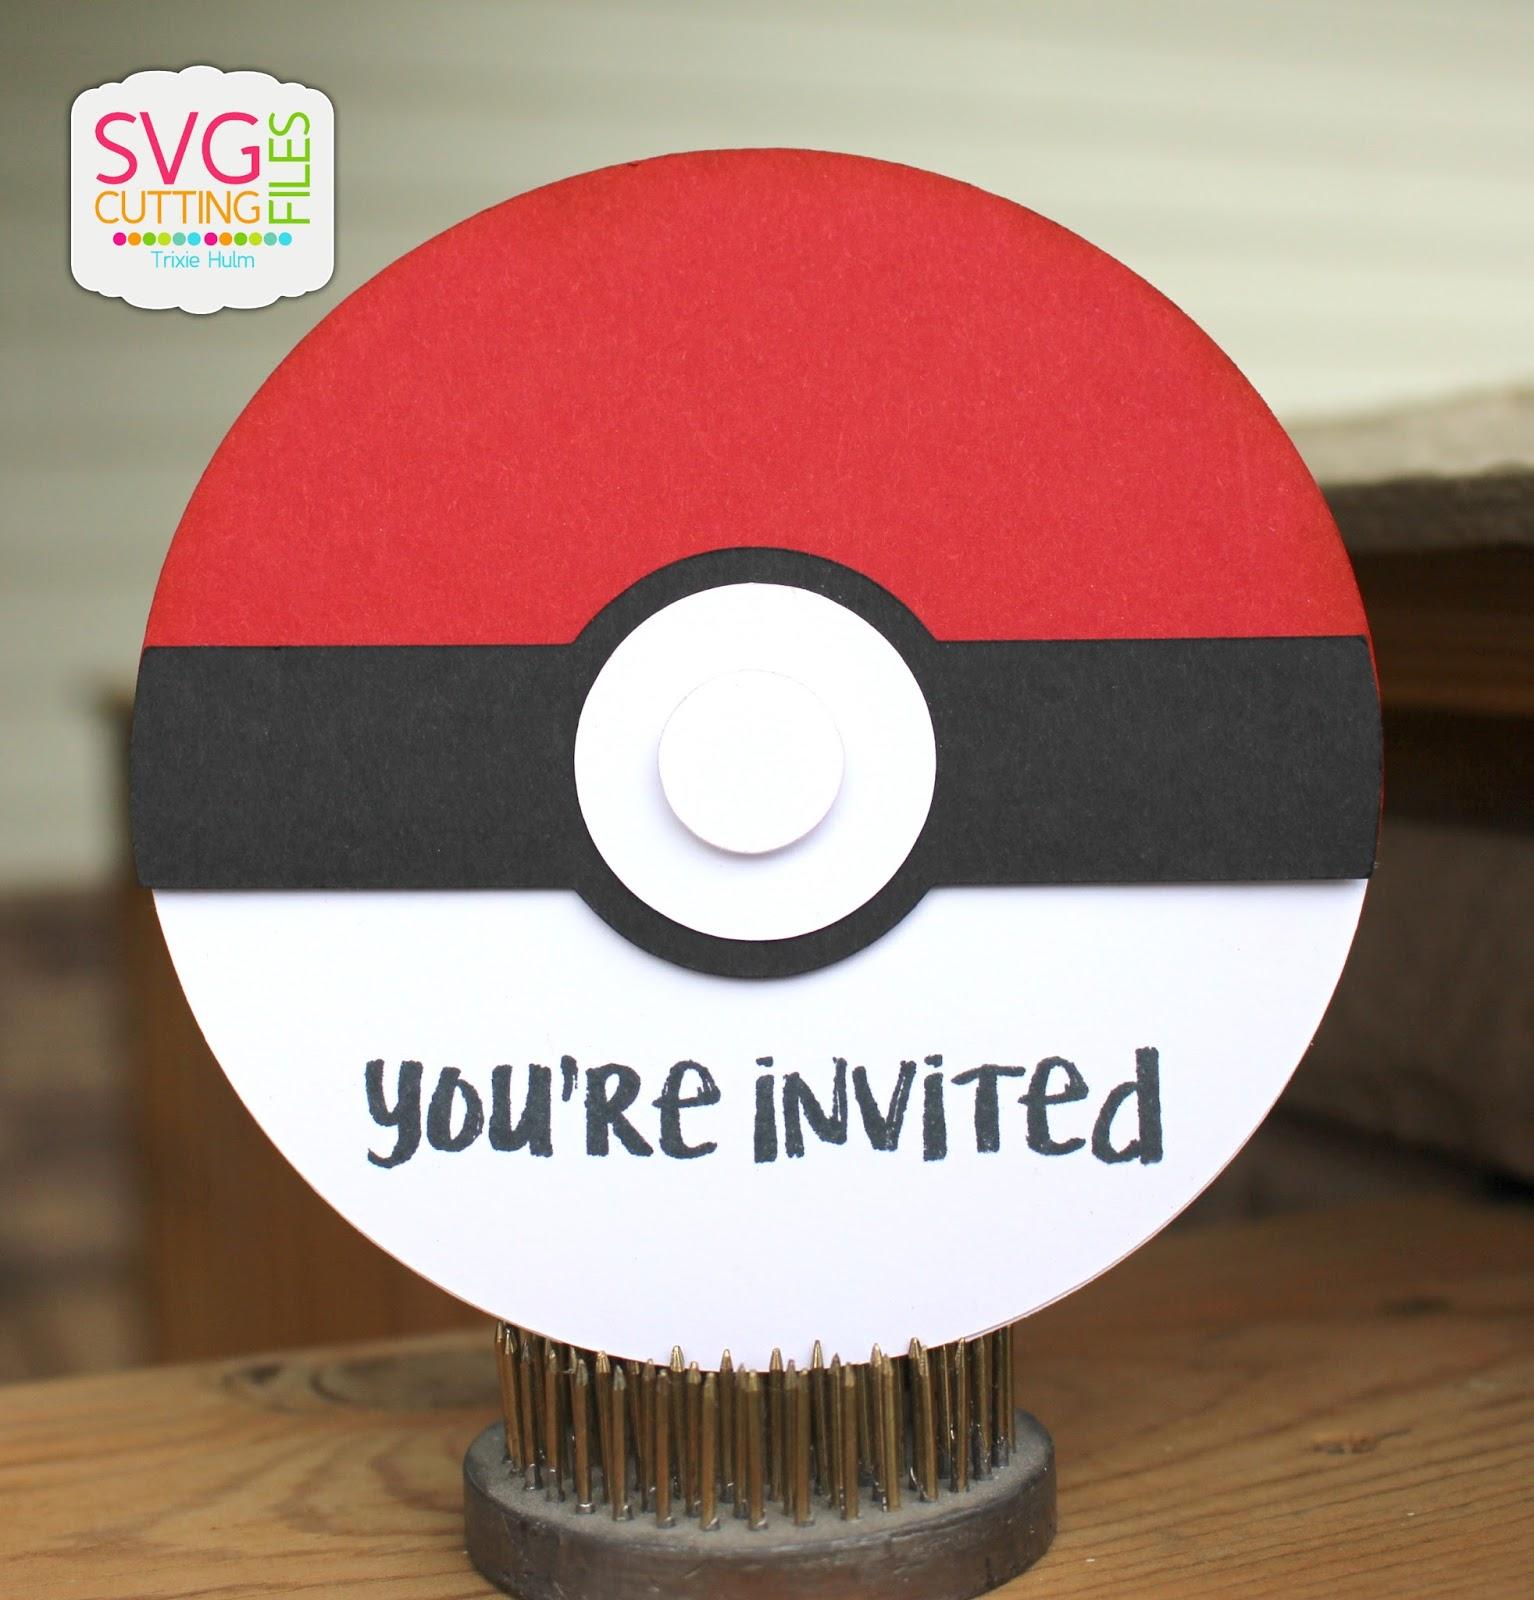 New Years Invitations was nice invitations design